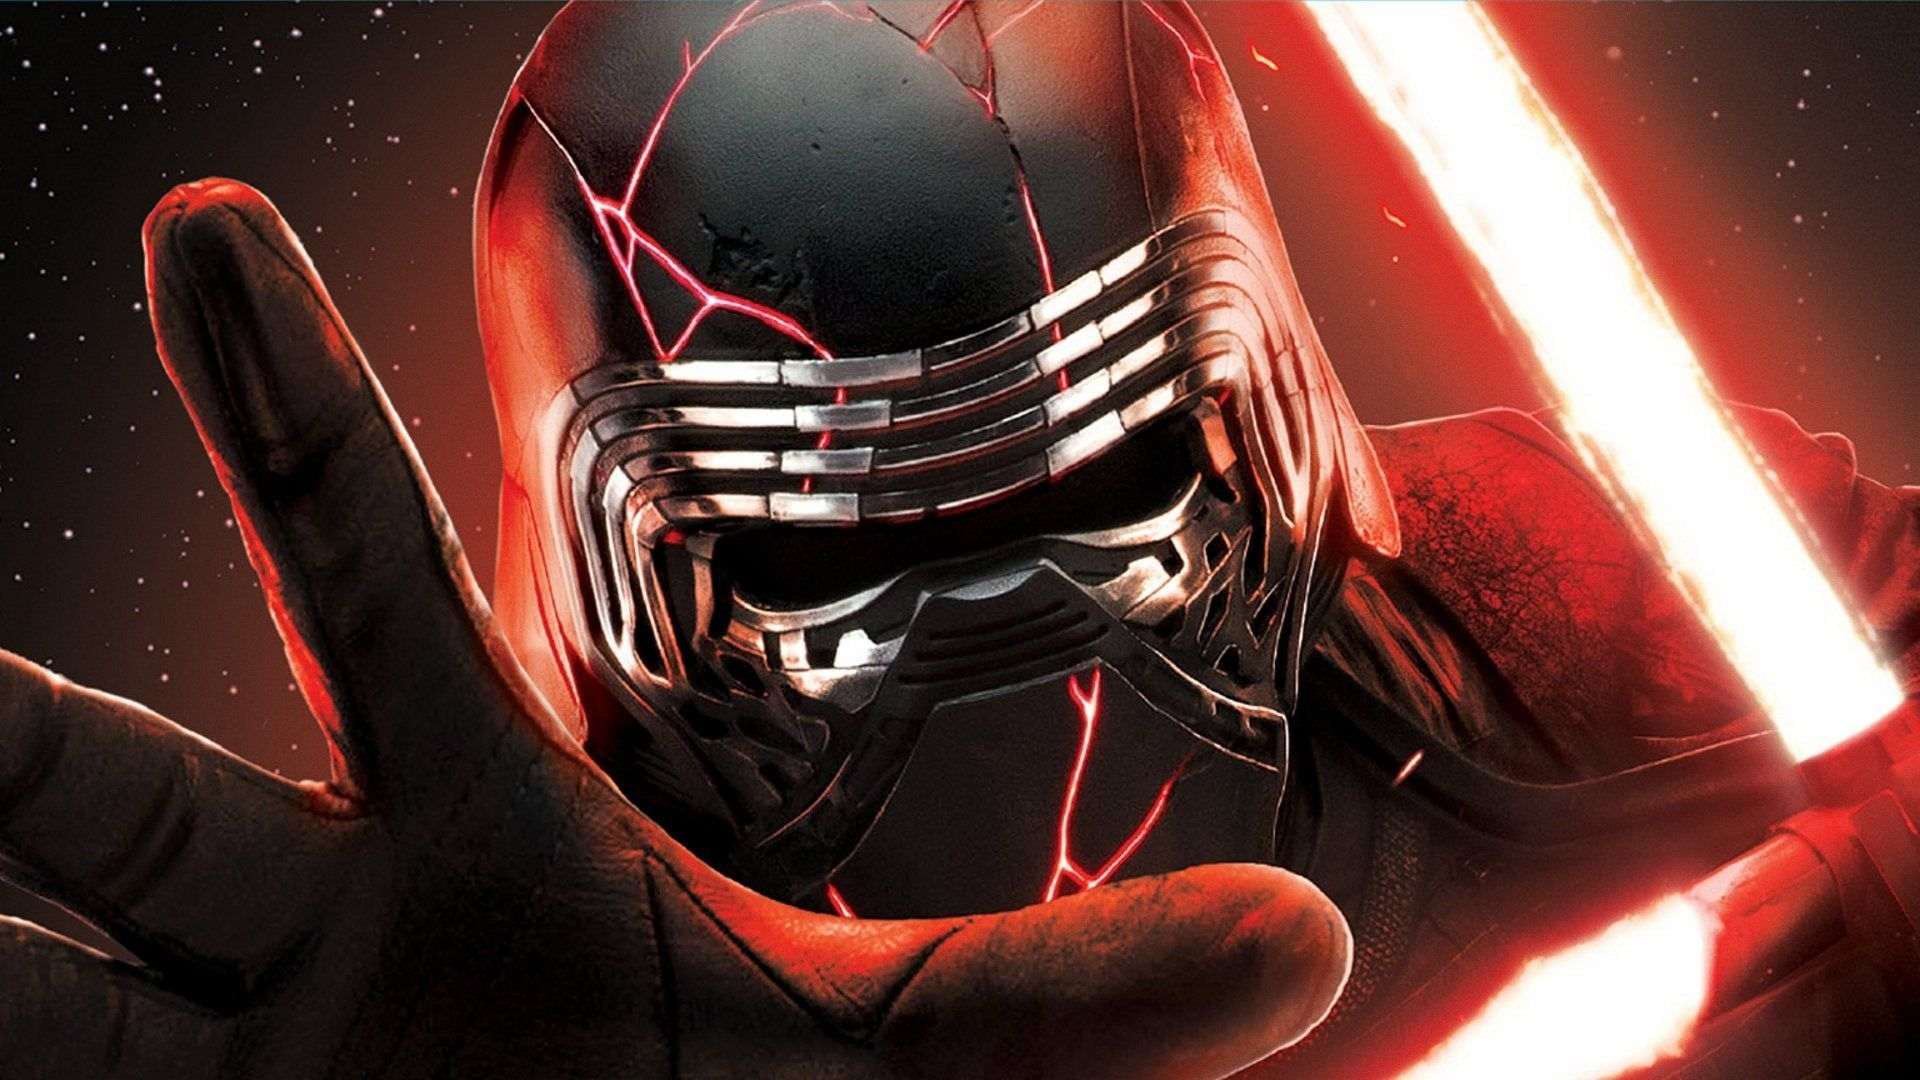 19 Best Star Wars The Rise Of Skywalker Wallpaper Ideas Star Wars Skywalker War